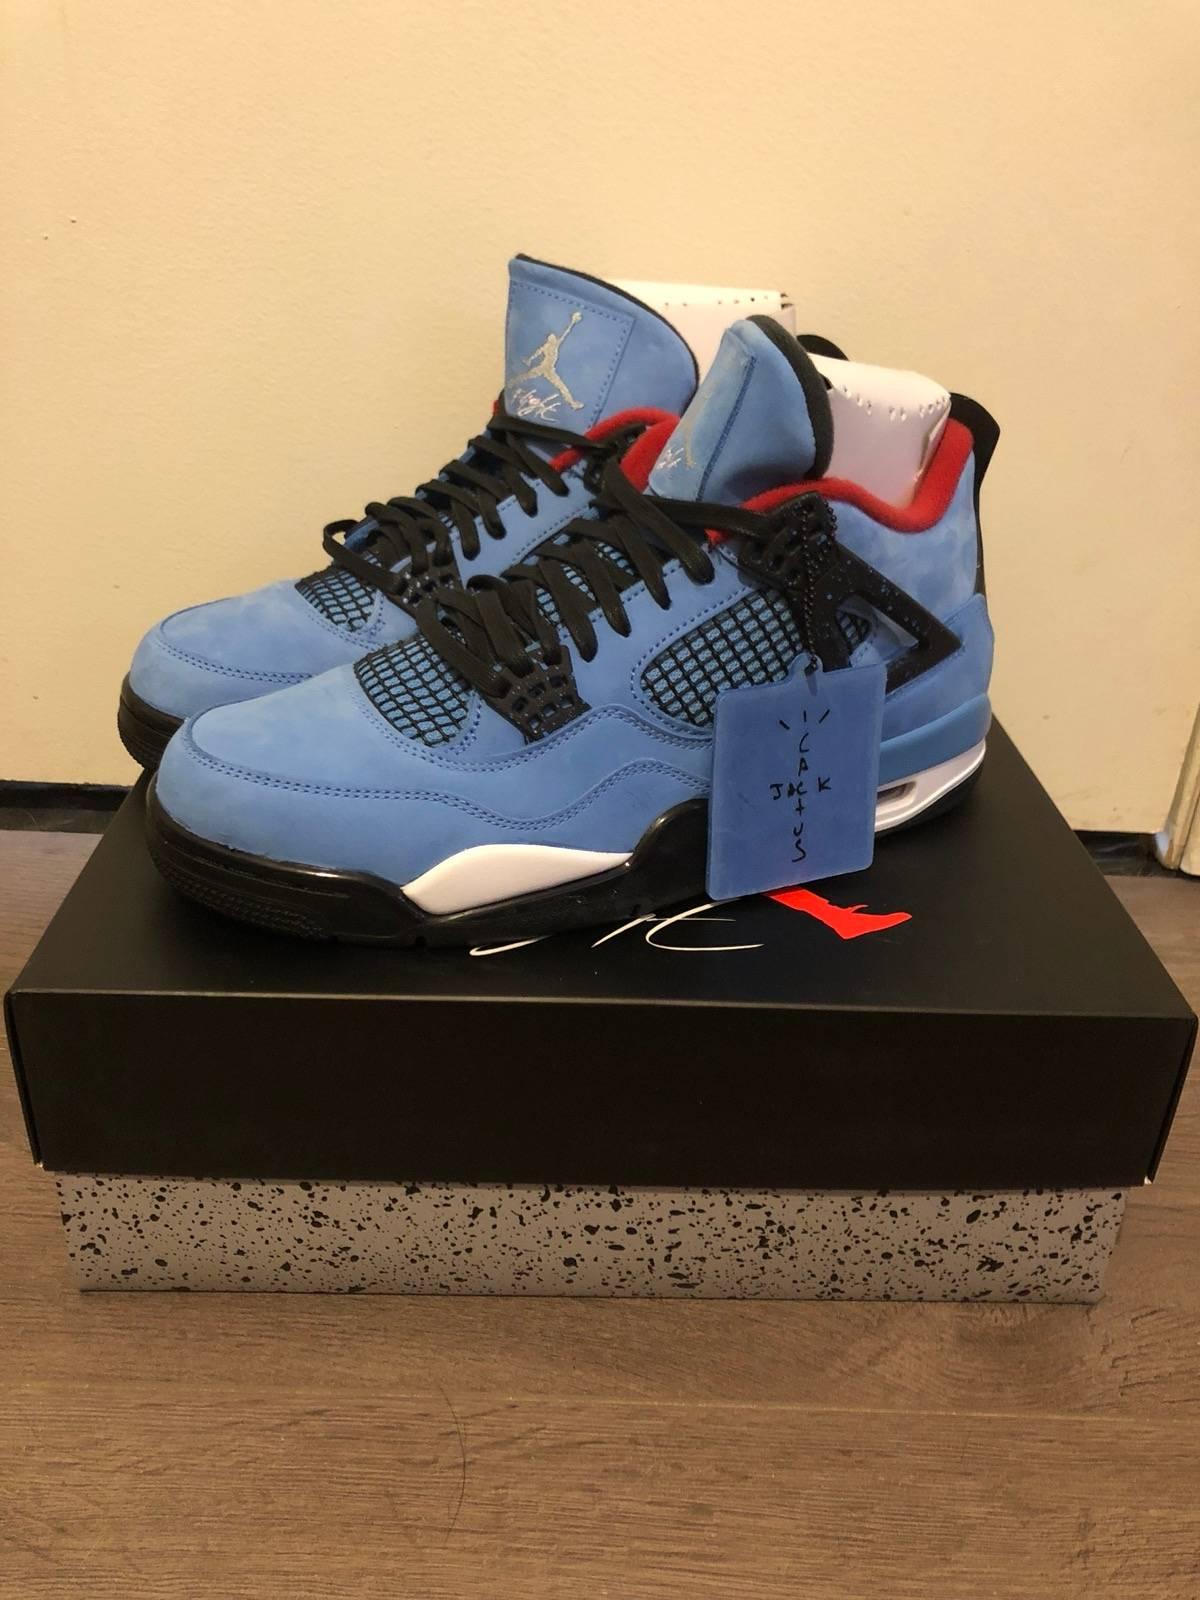 "27d6d6b07949 Travis Scott ""Cactus Jack"" Air Jordan 4s Size 10.5 - Hi-Top Sneakers for  Sale - Grailed"